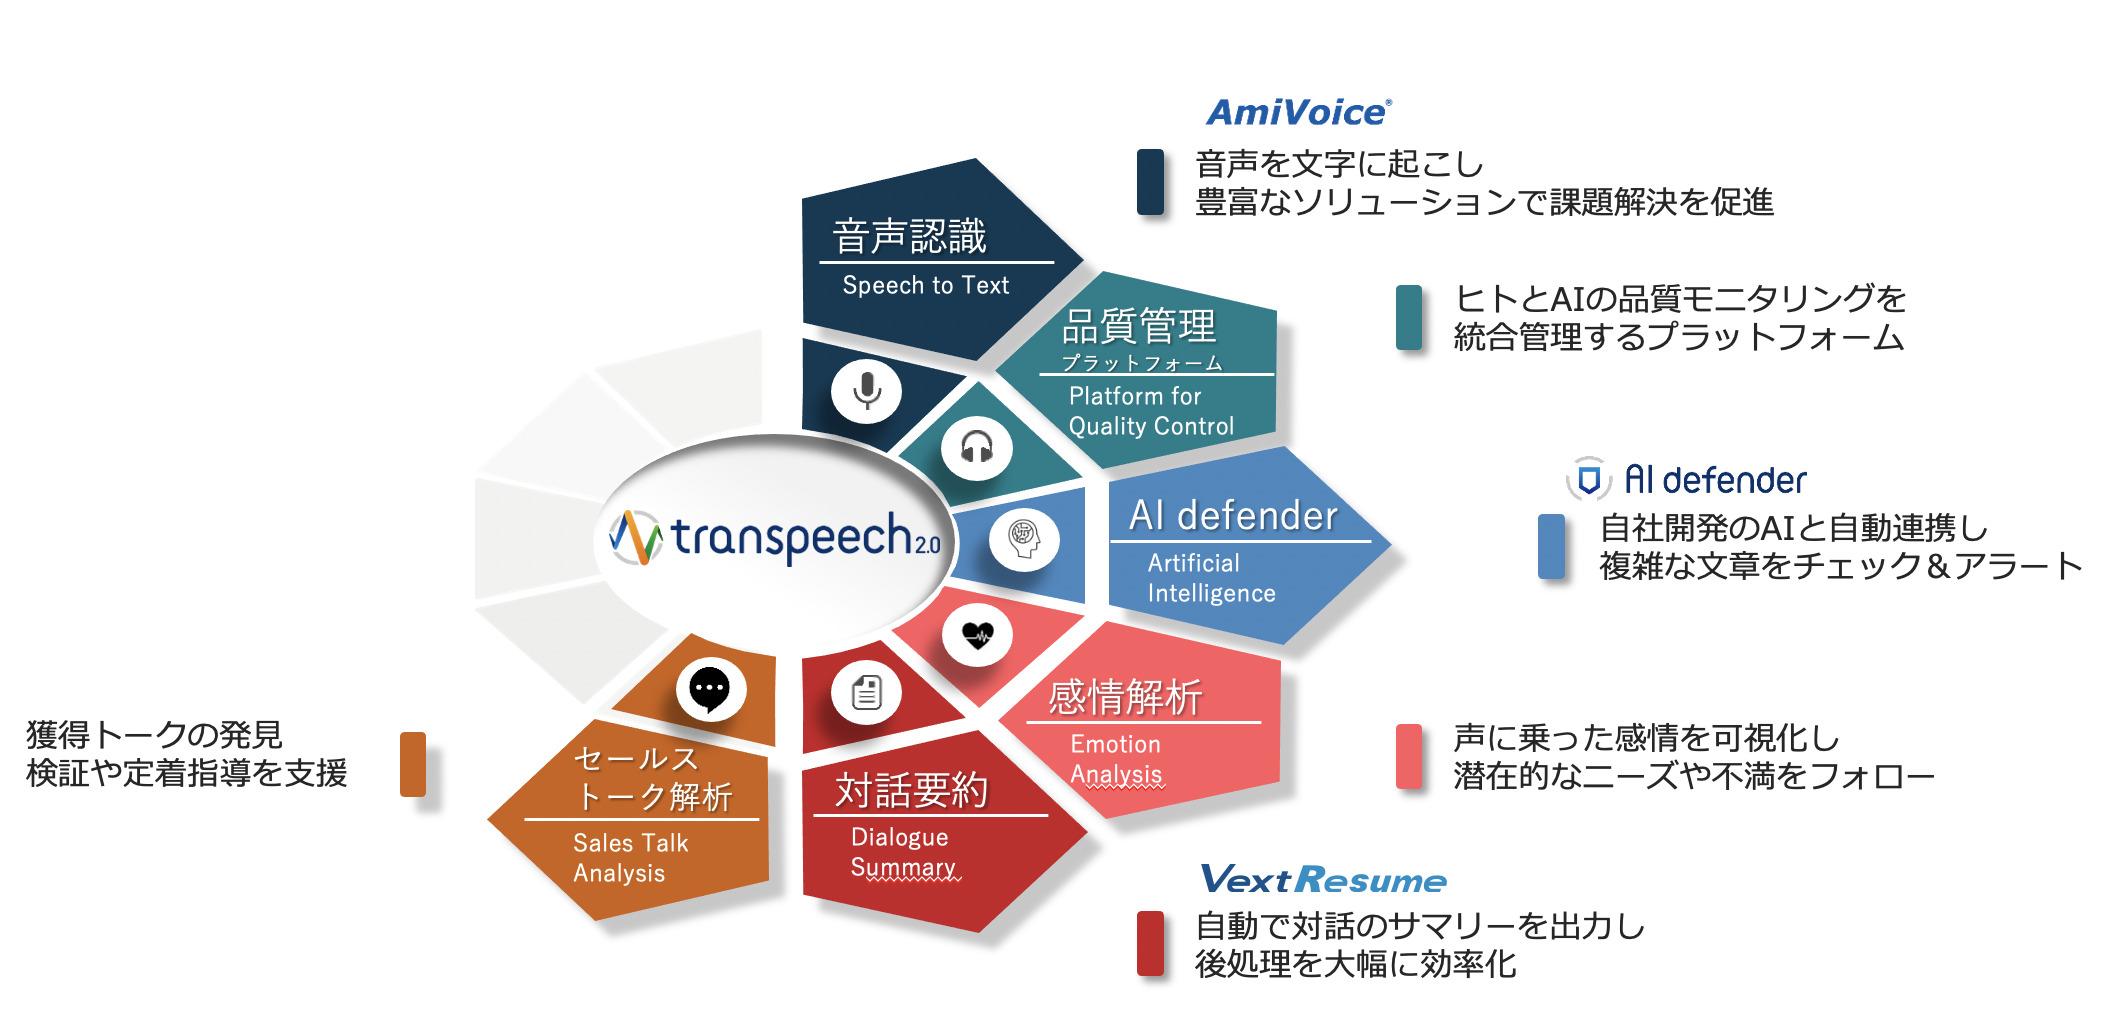 transpeech2.0の6つの機能と活用方法